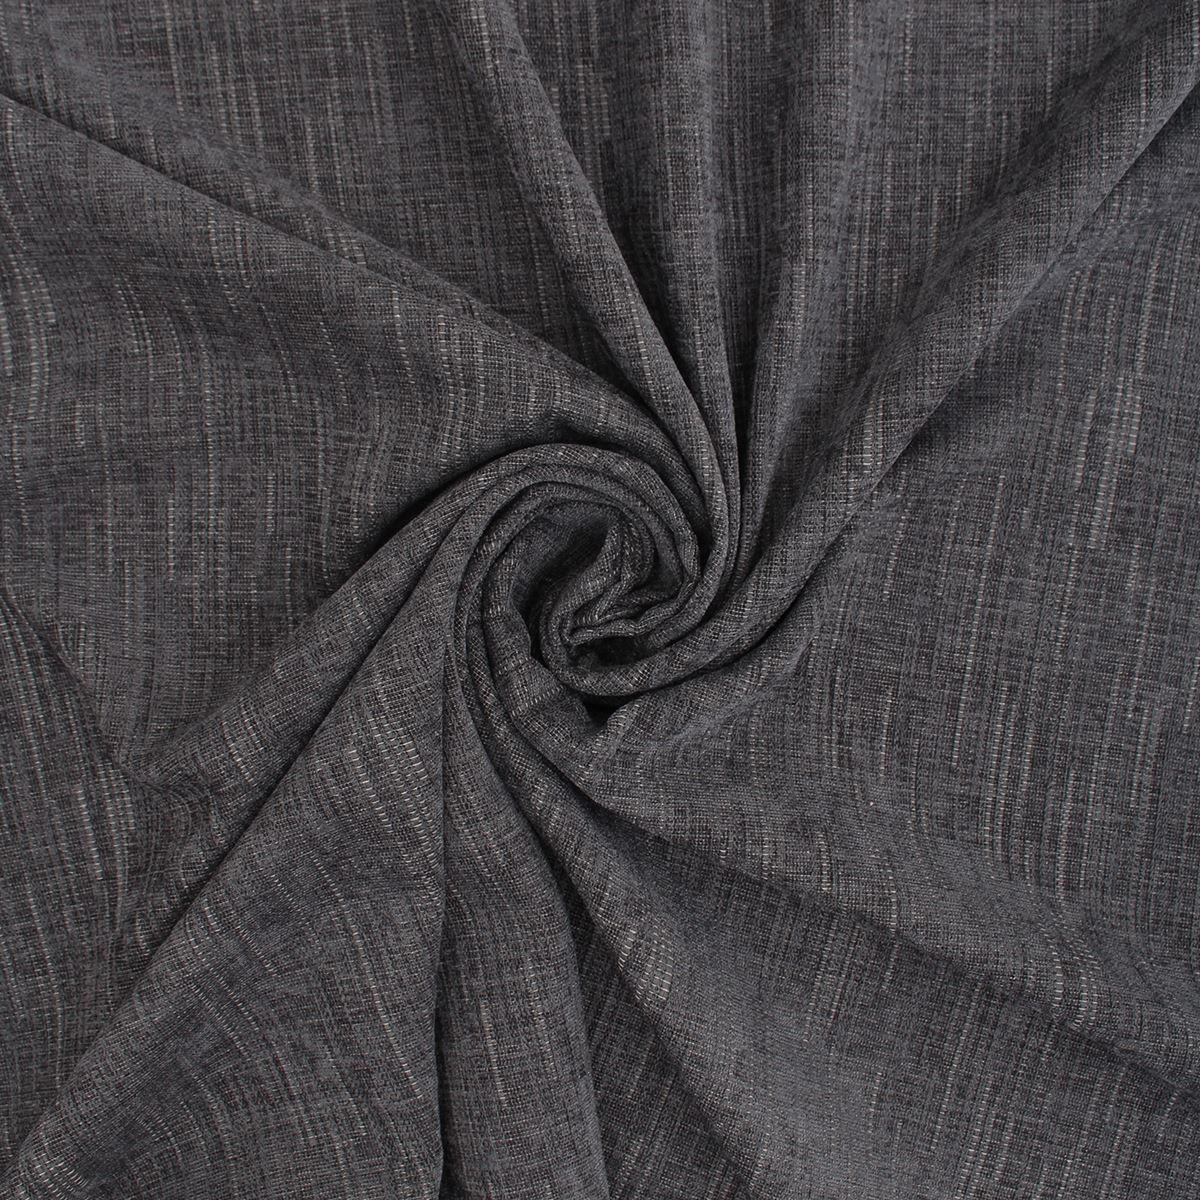 034-Chenille-034-Slubbed-Shabby-Worn-Look-Curtain-Cushion-Sofa-Upholstery-Fabric thumbnail 26